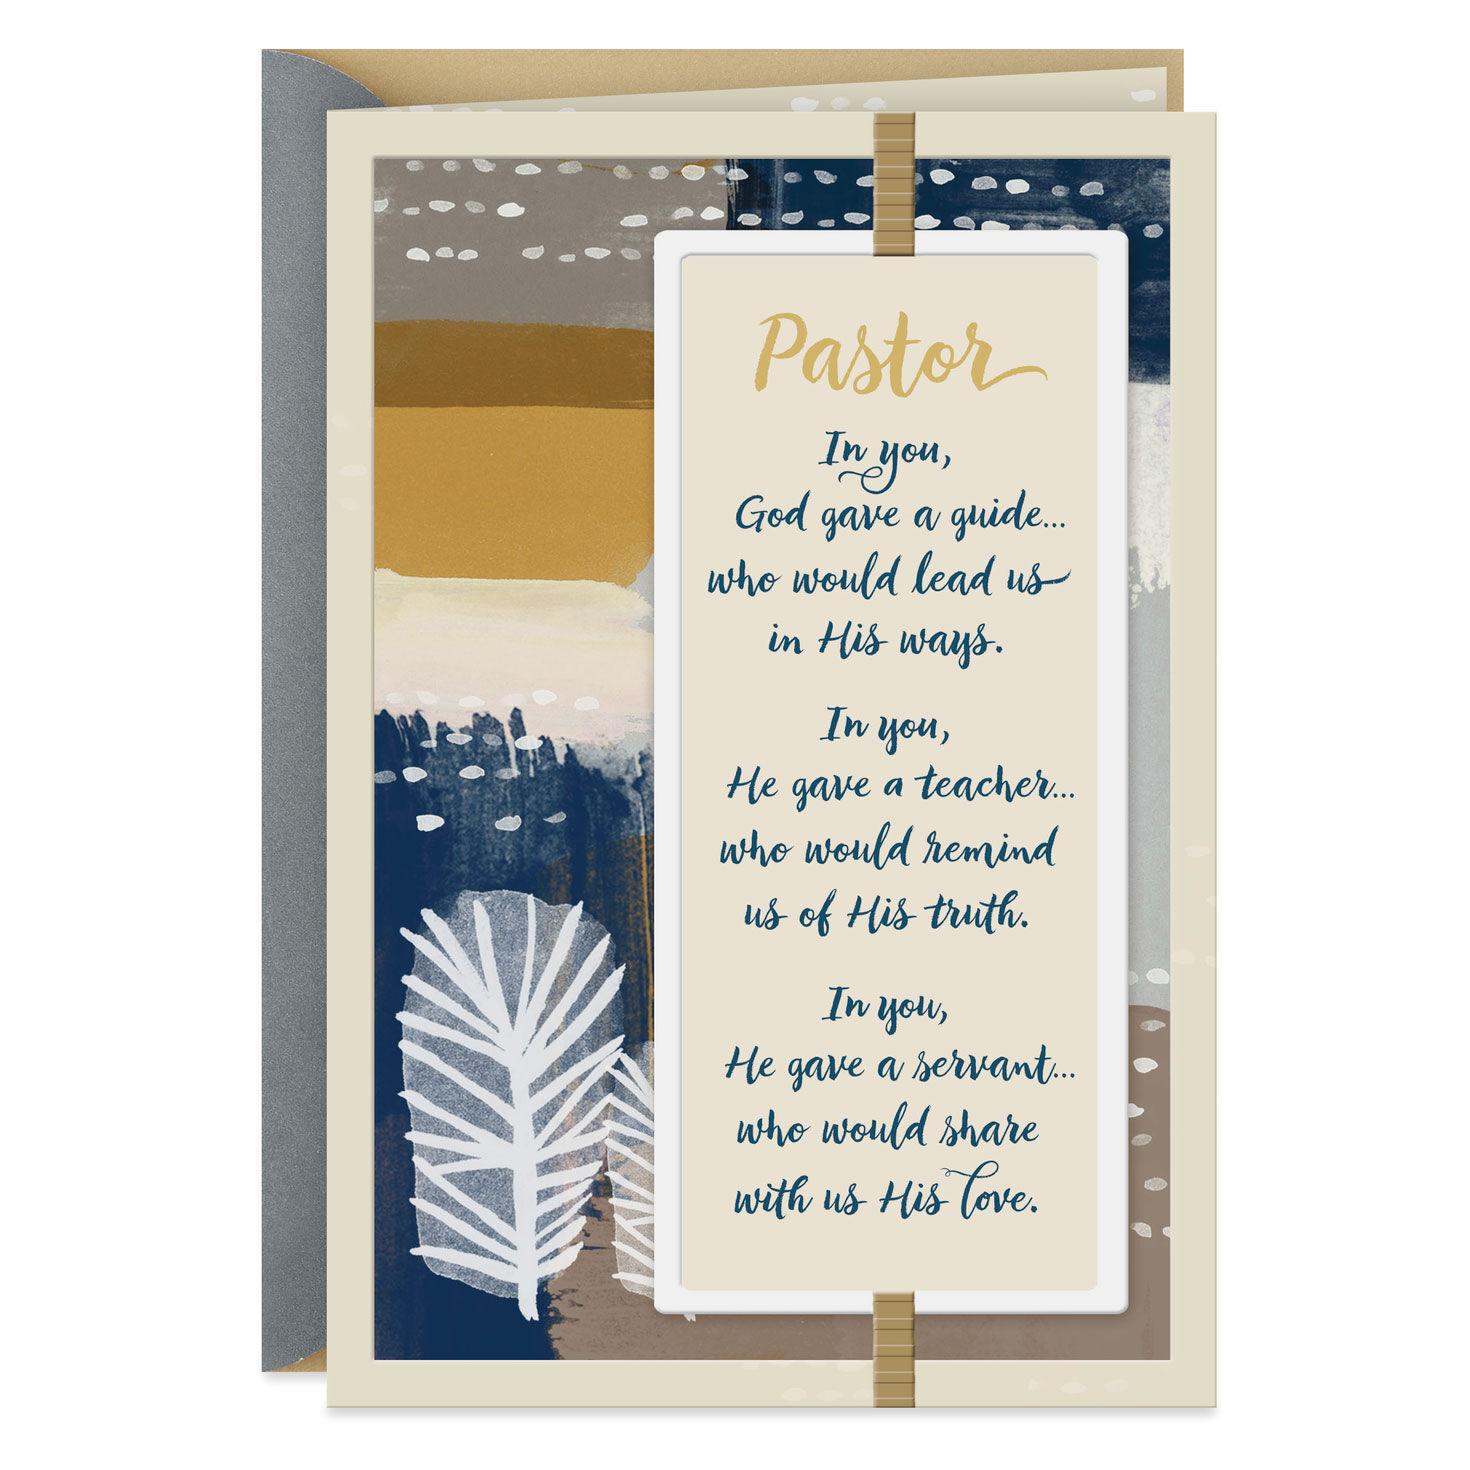 image about Pastor Appreciation Cards Free Printable named Clergy Pastor Appreciation Hallmark